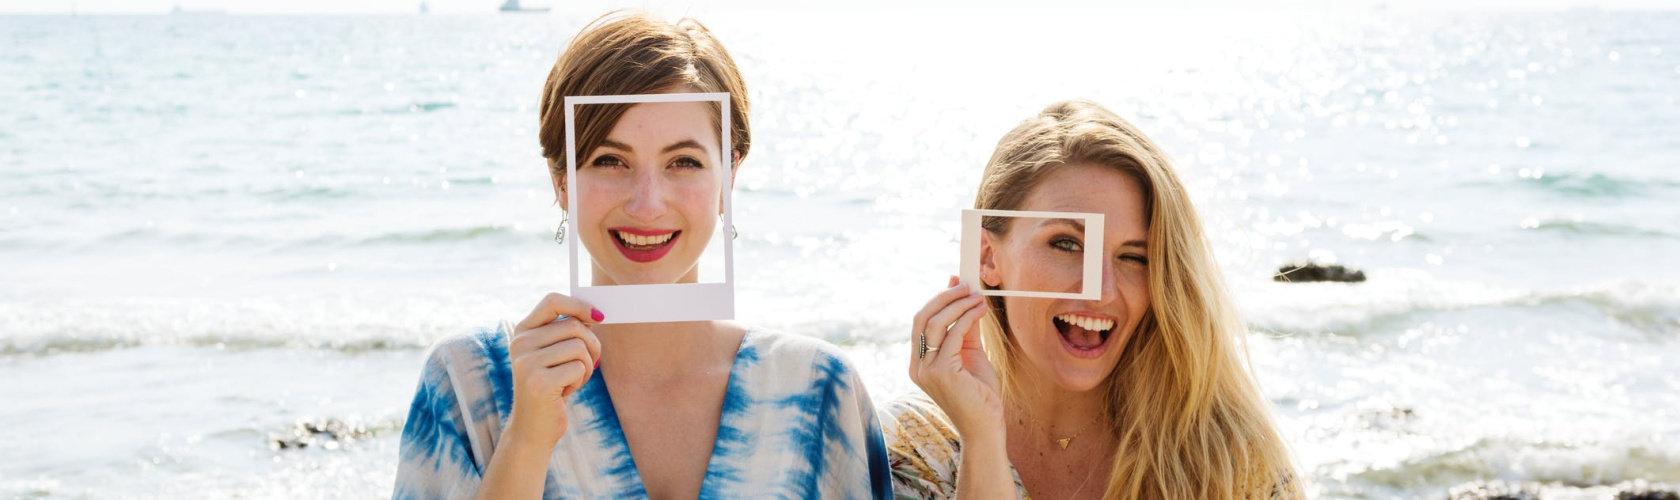 Pjeskarenje je metoda profesionalnog čišćenja zubi